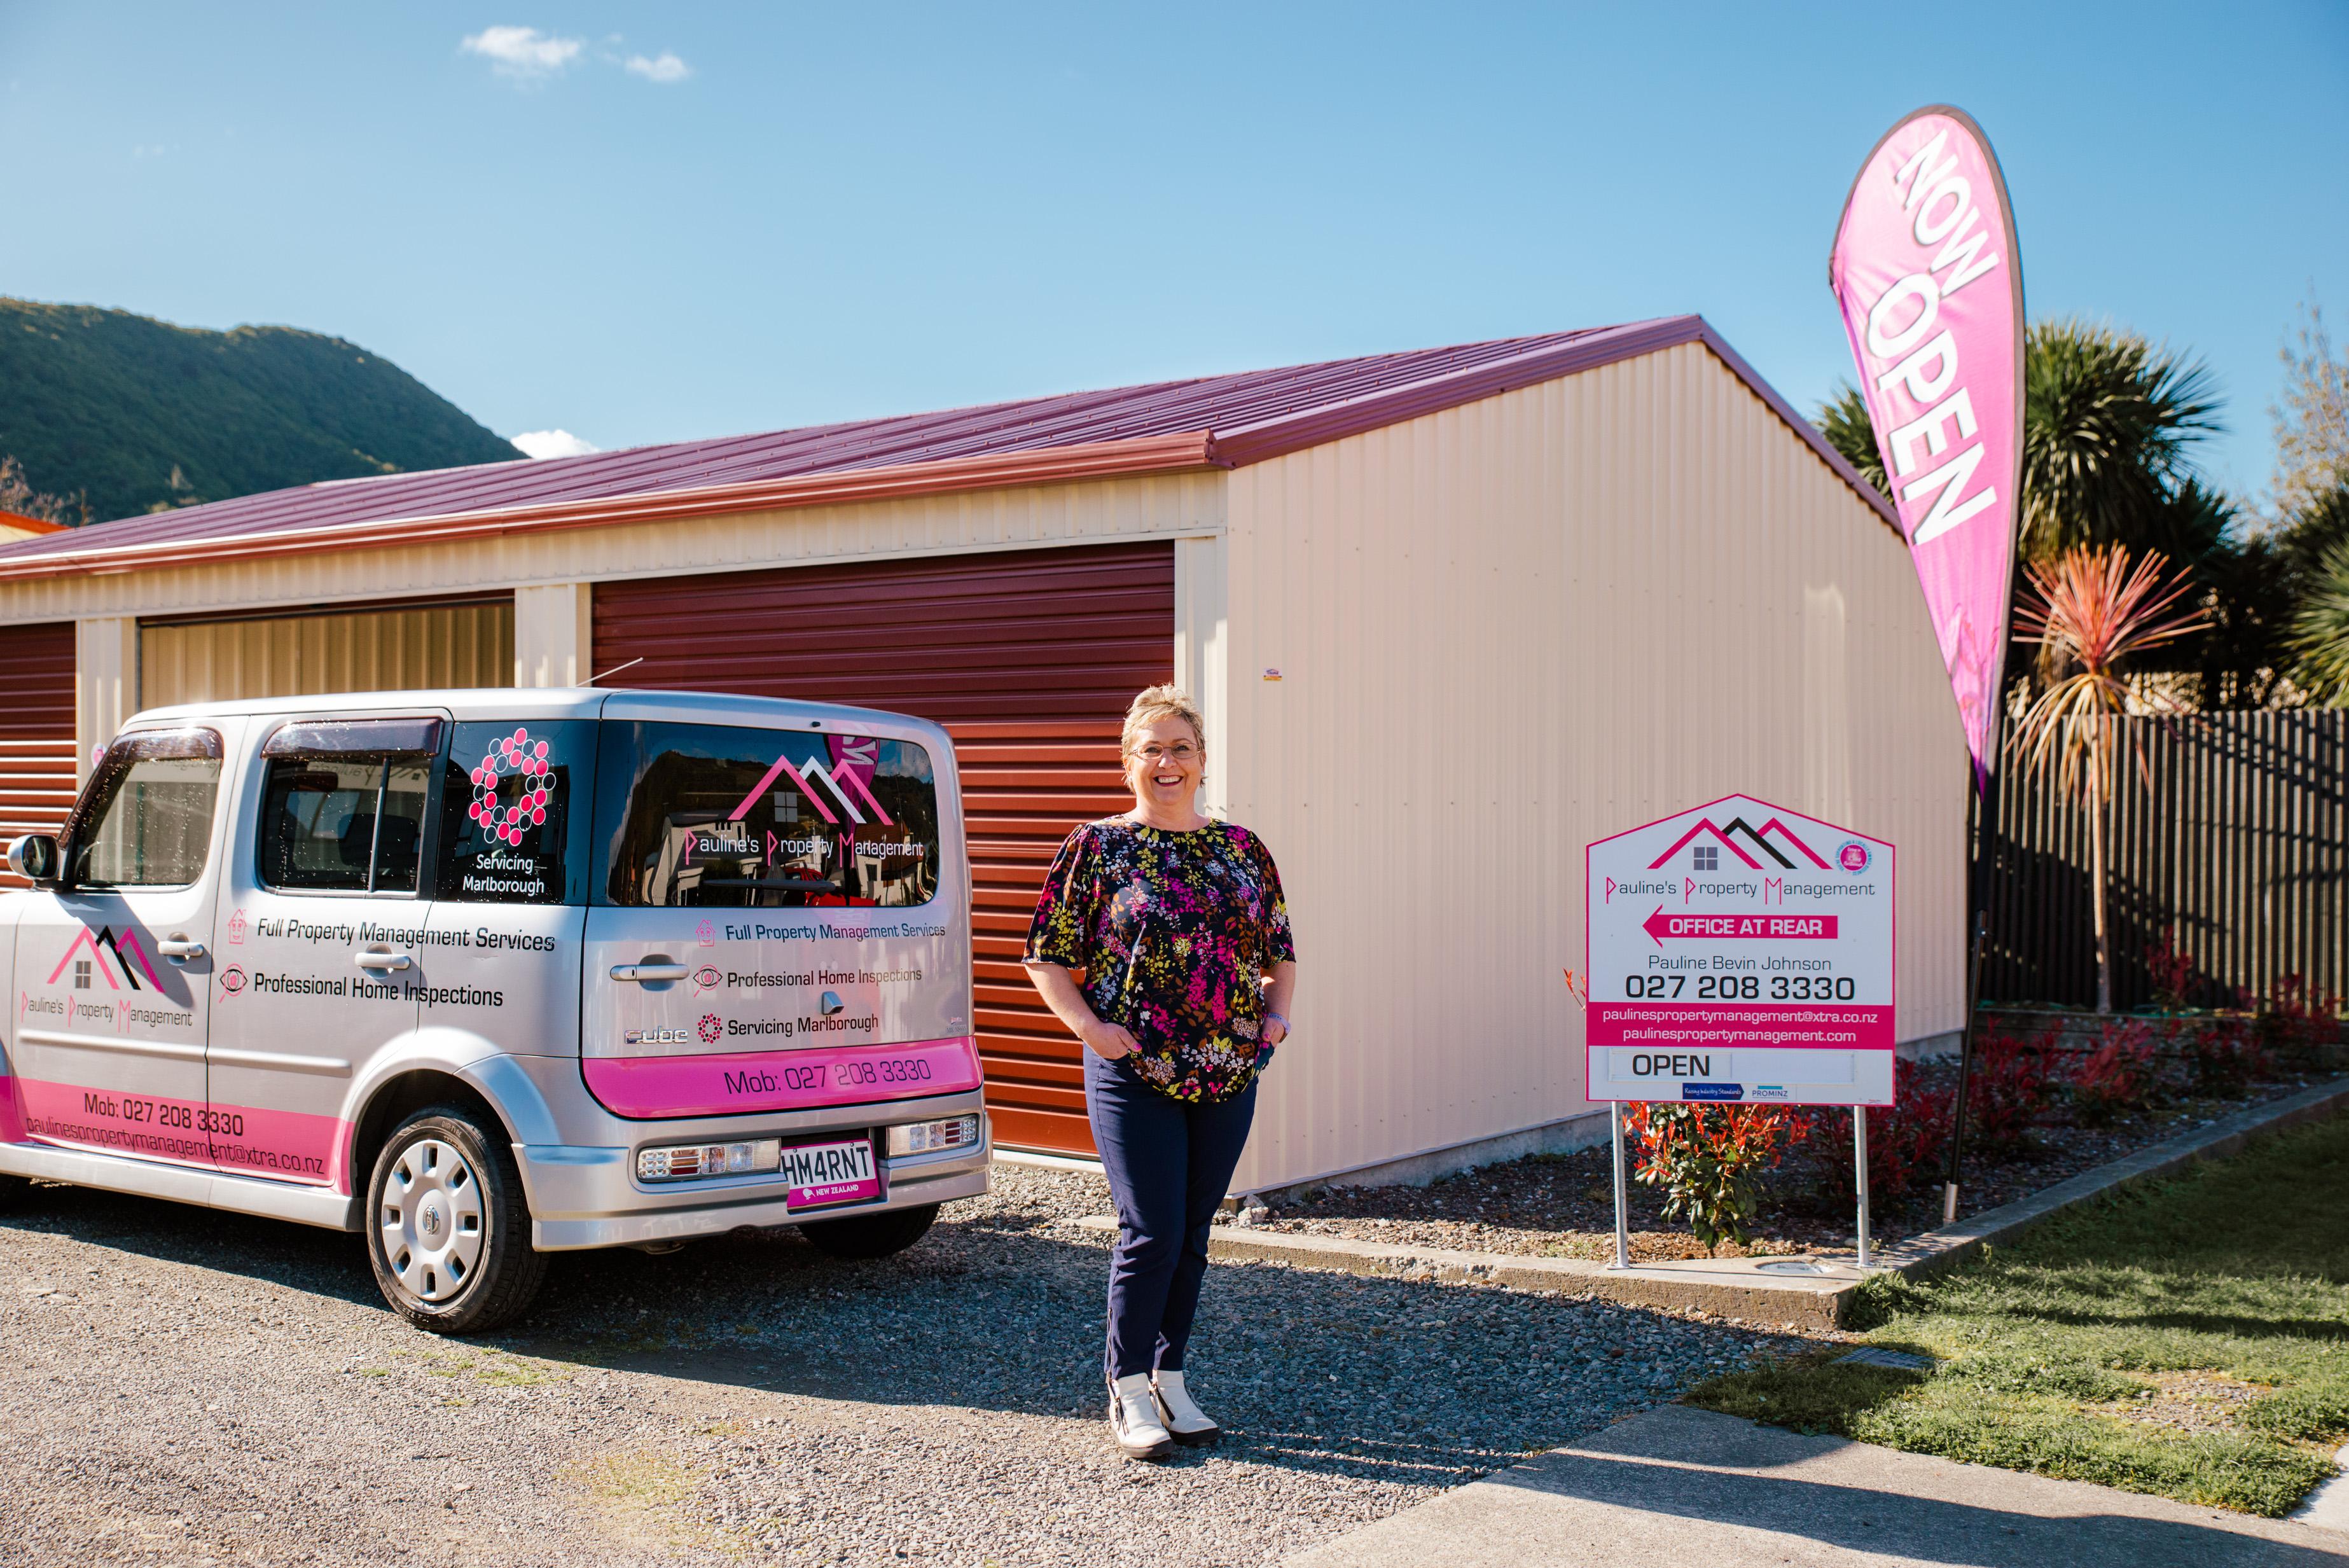 paulines property management business mentors new zealand